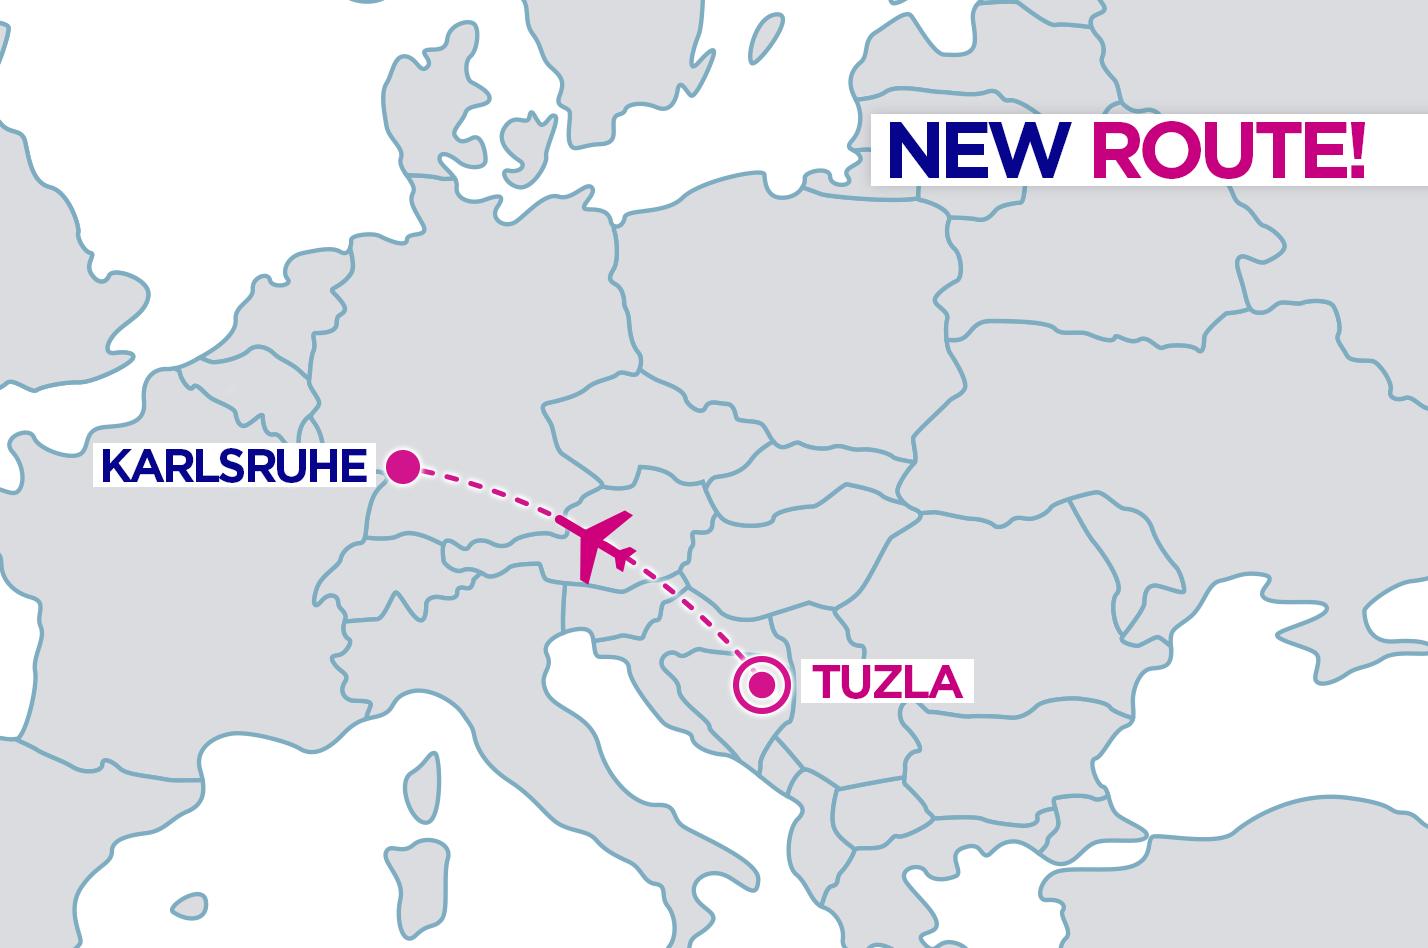 Bosnia and Herzegovina aviation news New route from Tuzla to